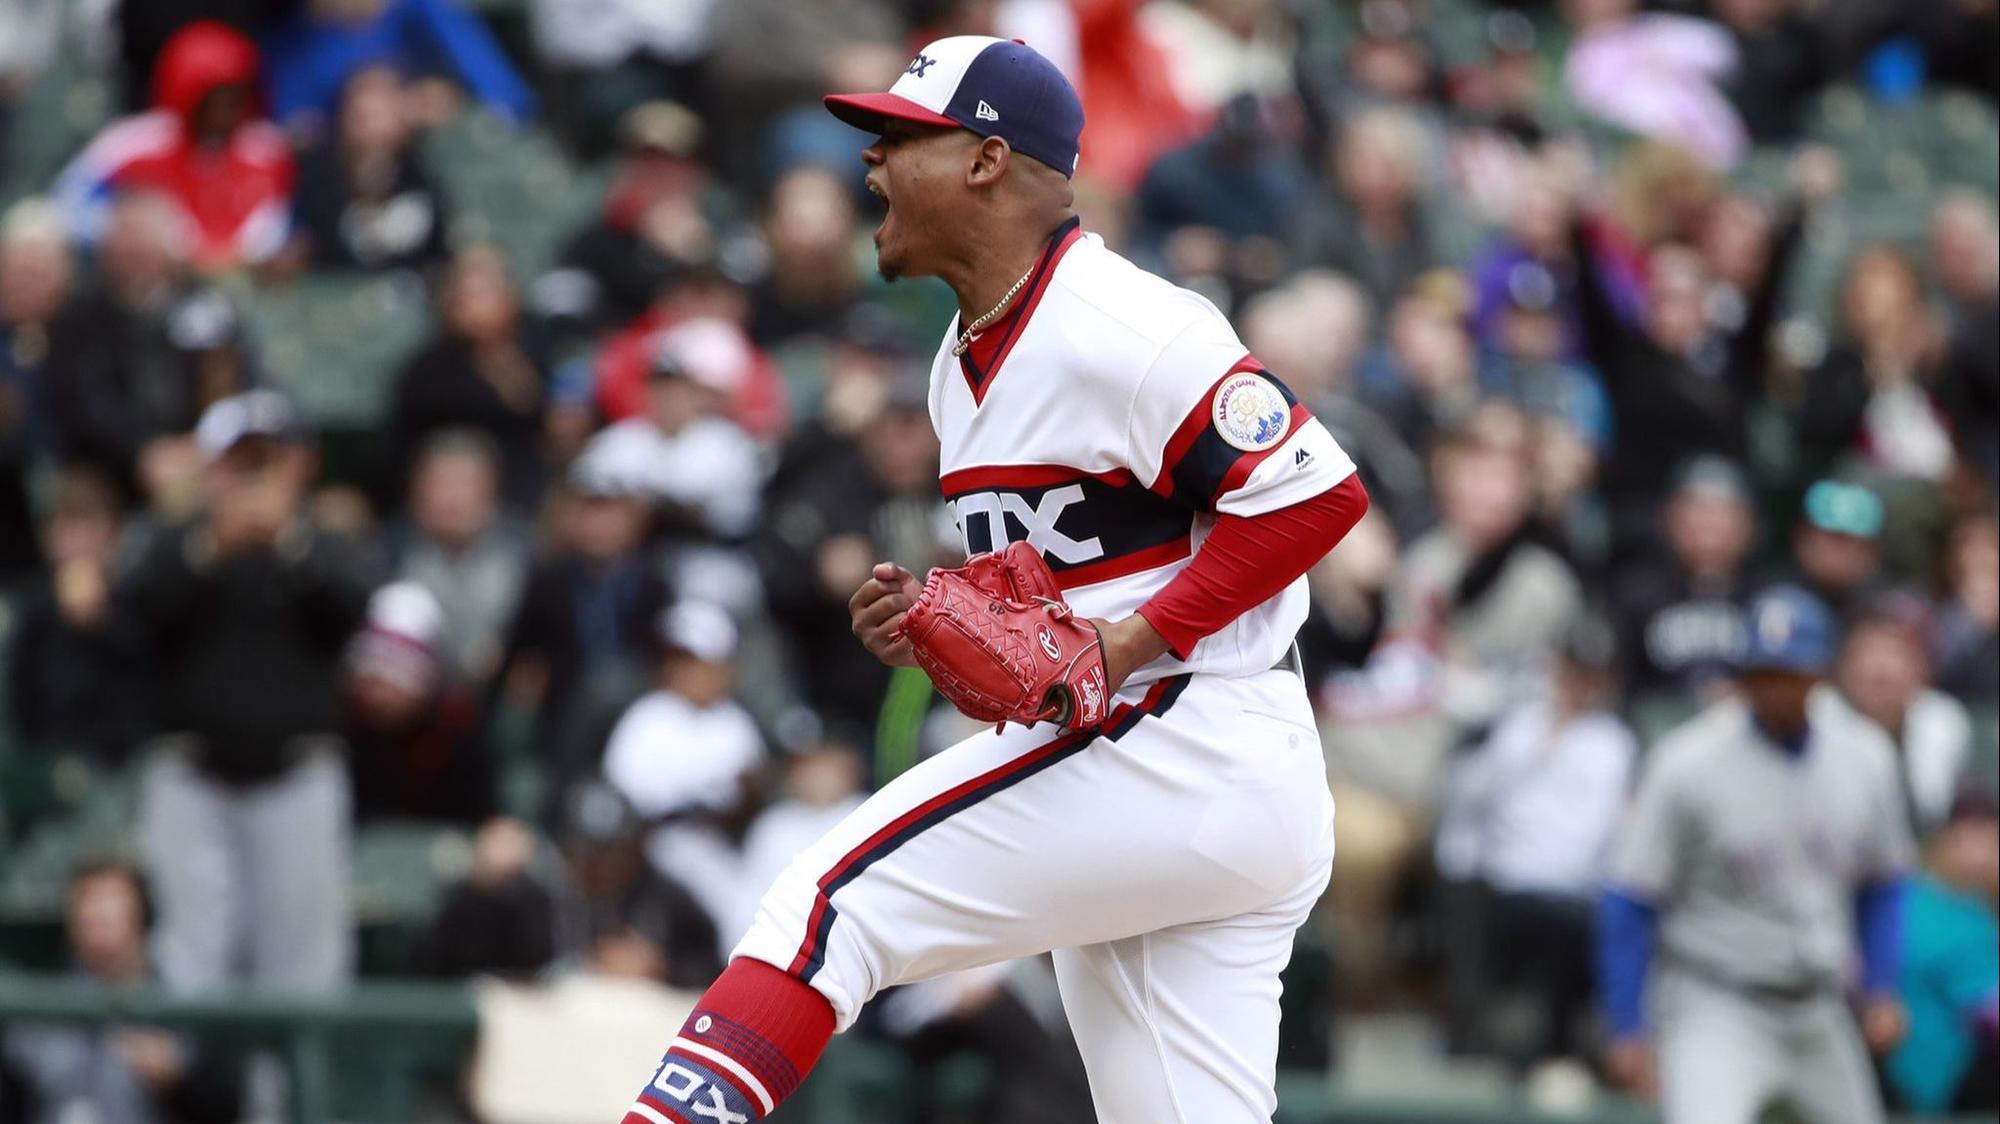 a6a86d26047f32 Baseball s weirdest uniforms get shredded in  Winning Ugly  - Chicago  Tribune